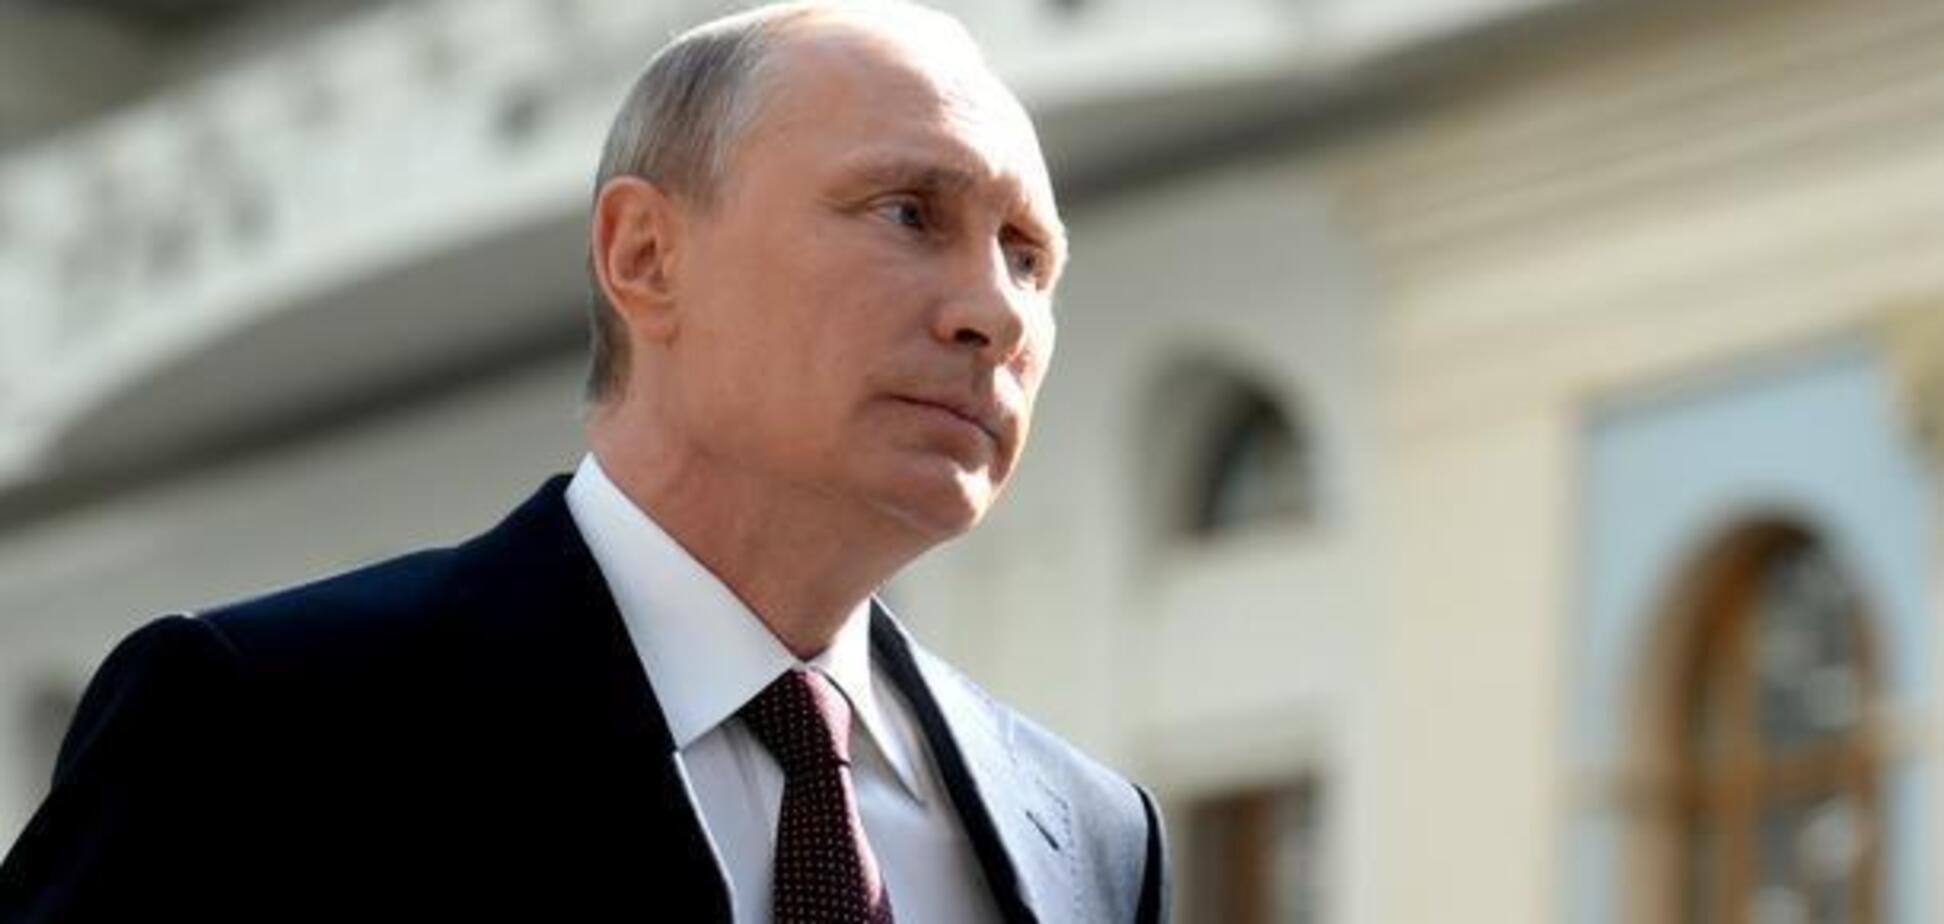 ''Станет политическим трупом'': названа цель Путина по Украине